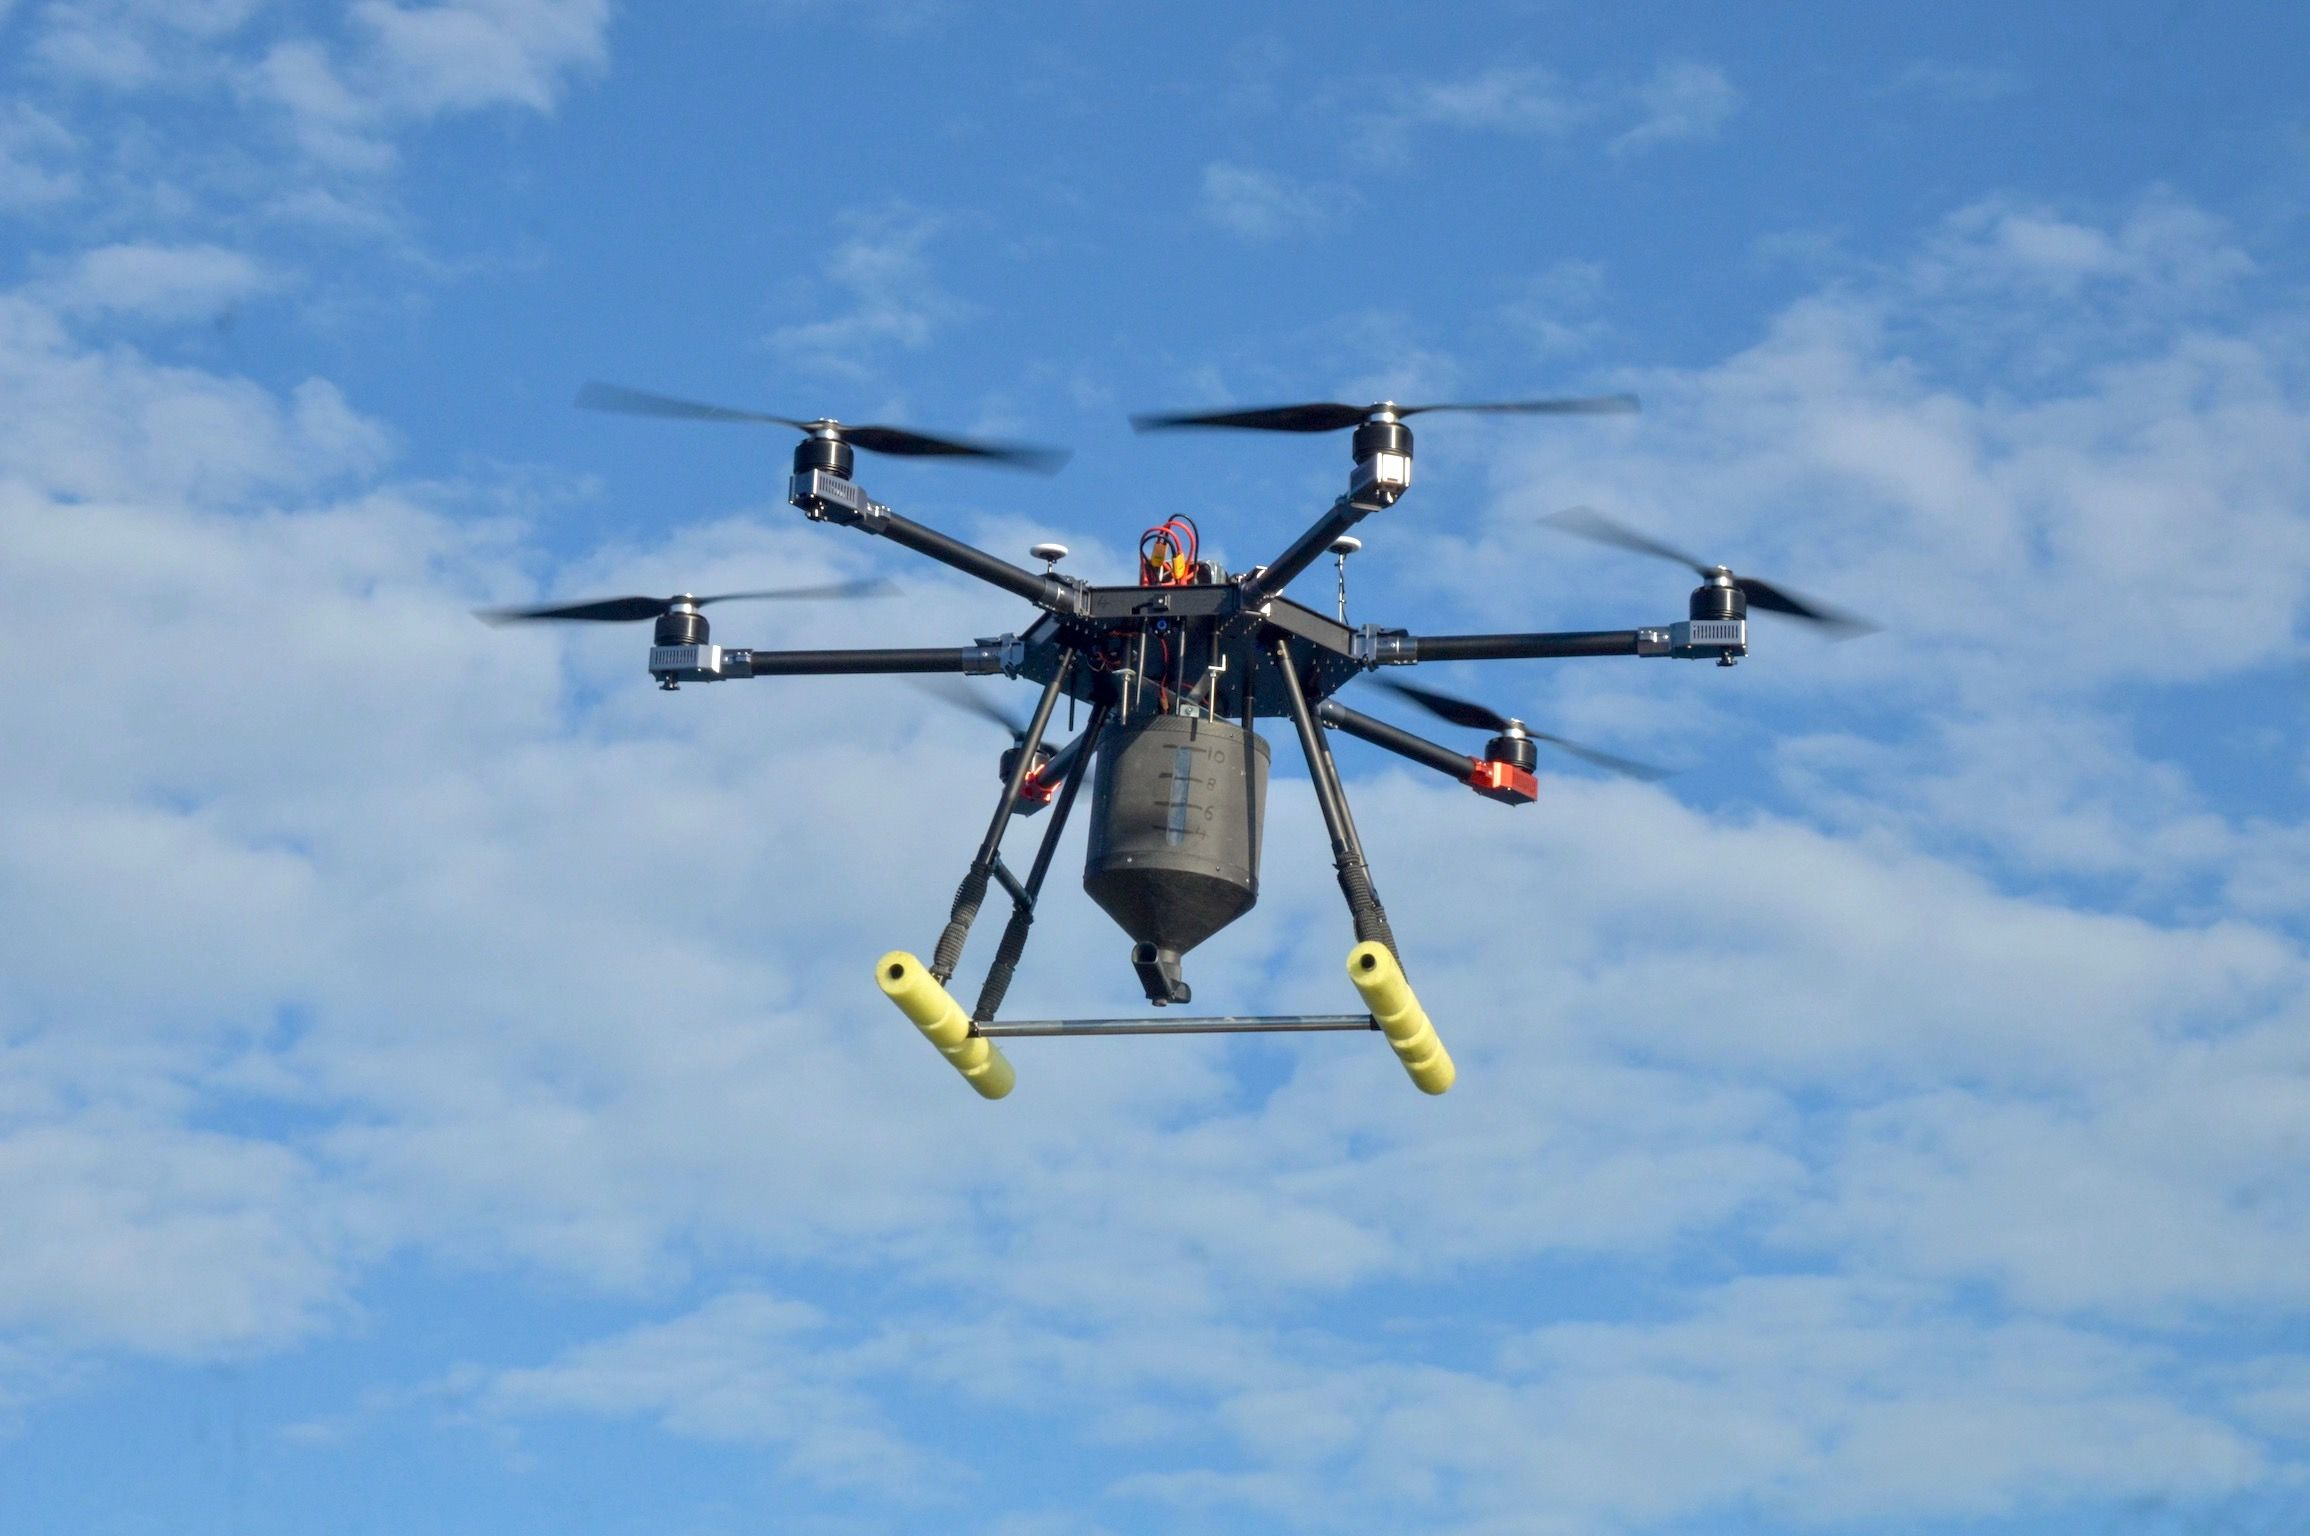 Drones Help Rid Galápagos Island of Invasive Rats